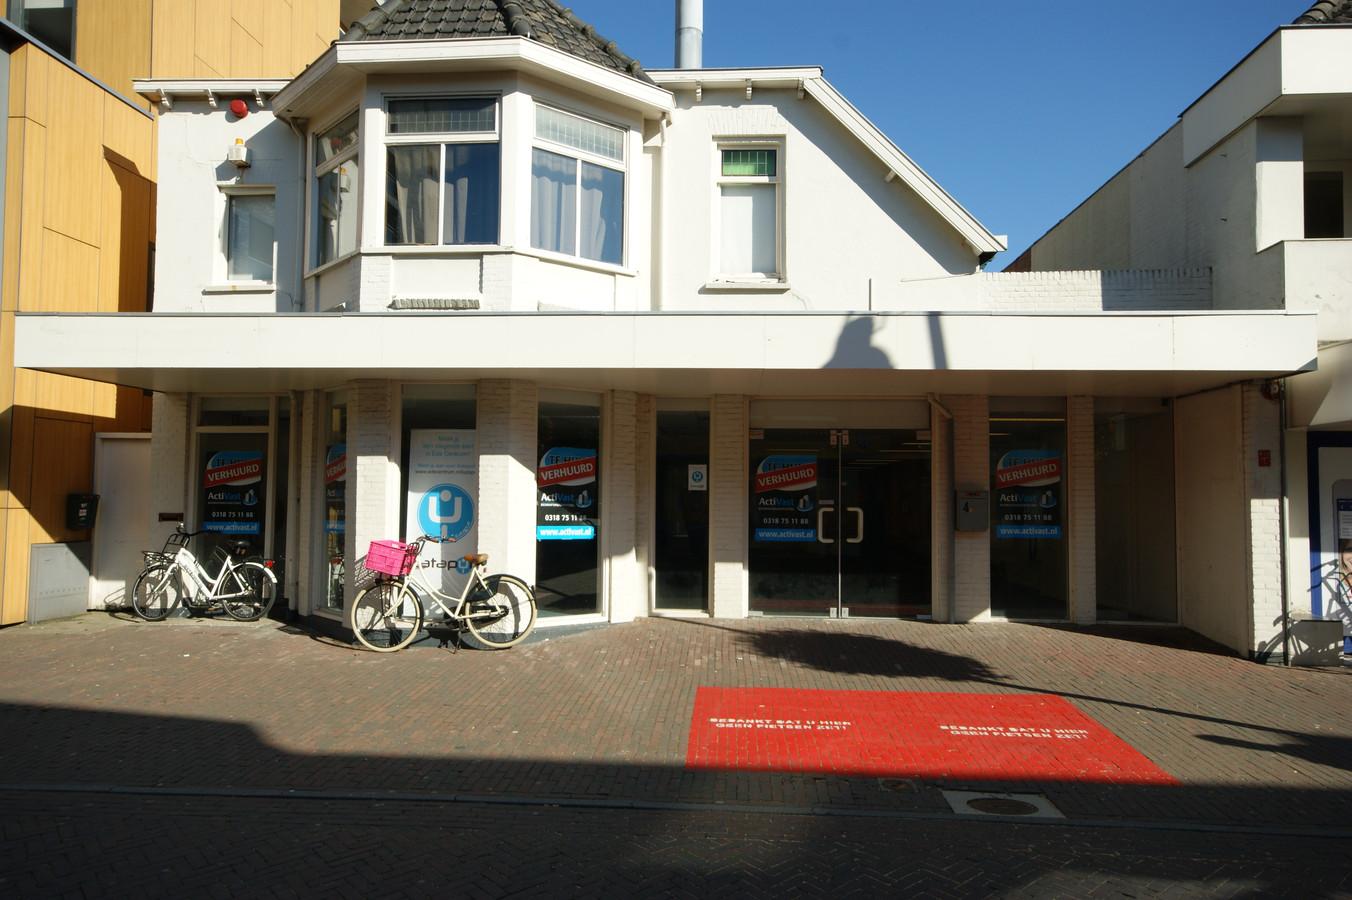 Eetkamer De Heksenketel Ede verhuist na brand | Ede | gelderlander.nl